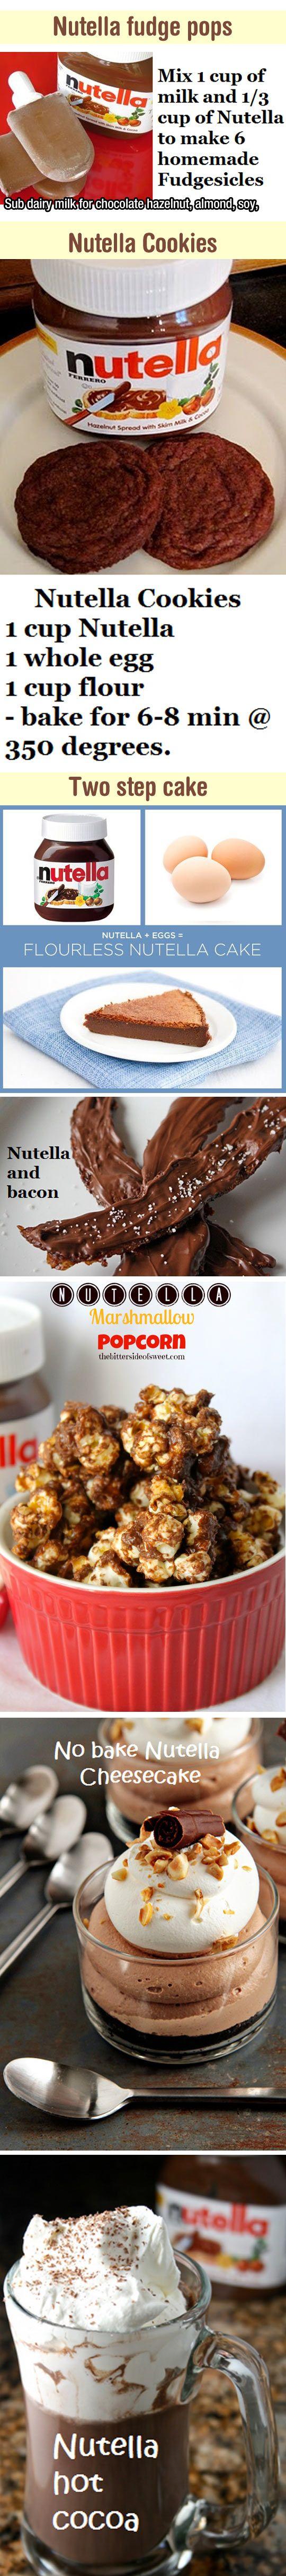 funny-Nutella-desserts-cooking-cocoa